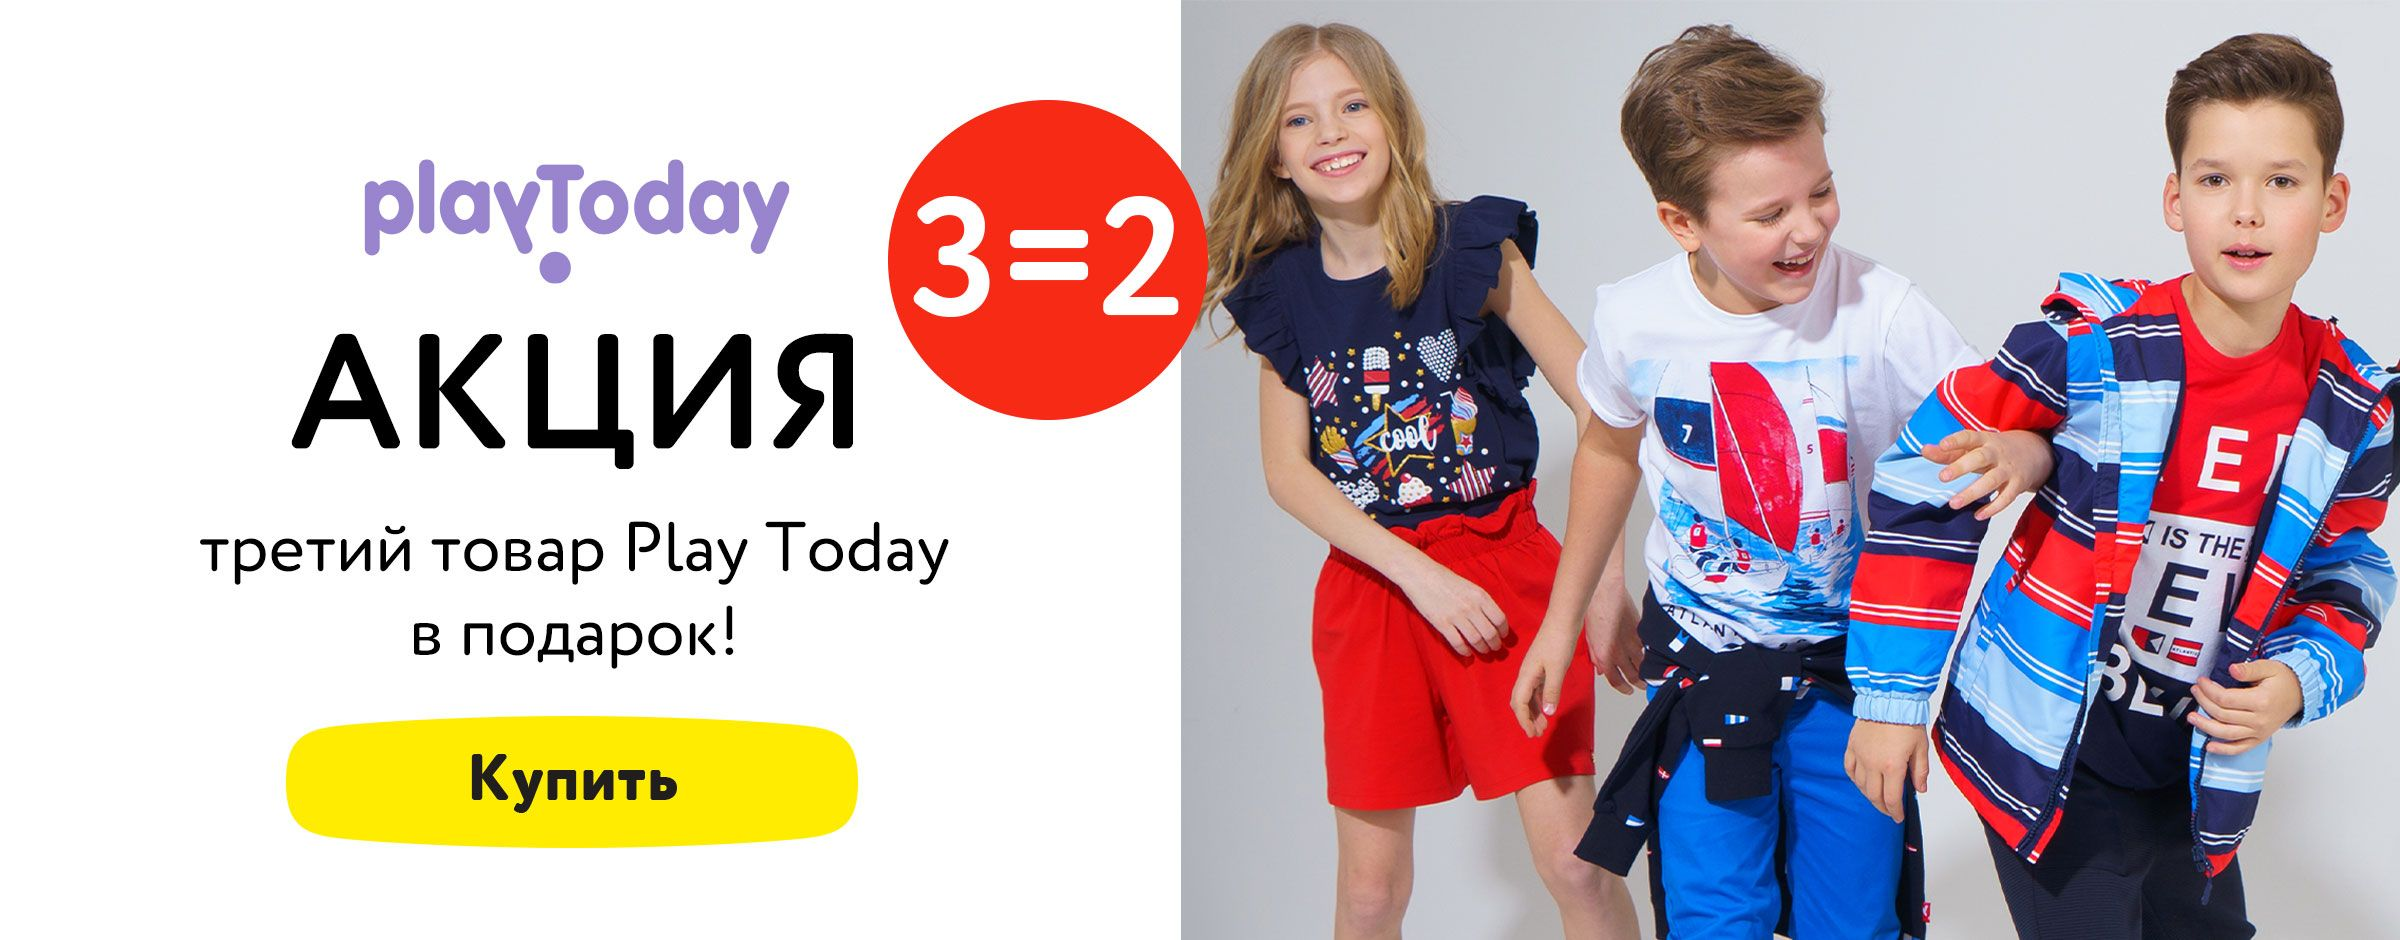 3=2 на PlayToday